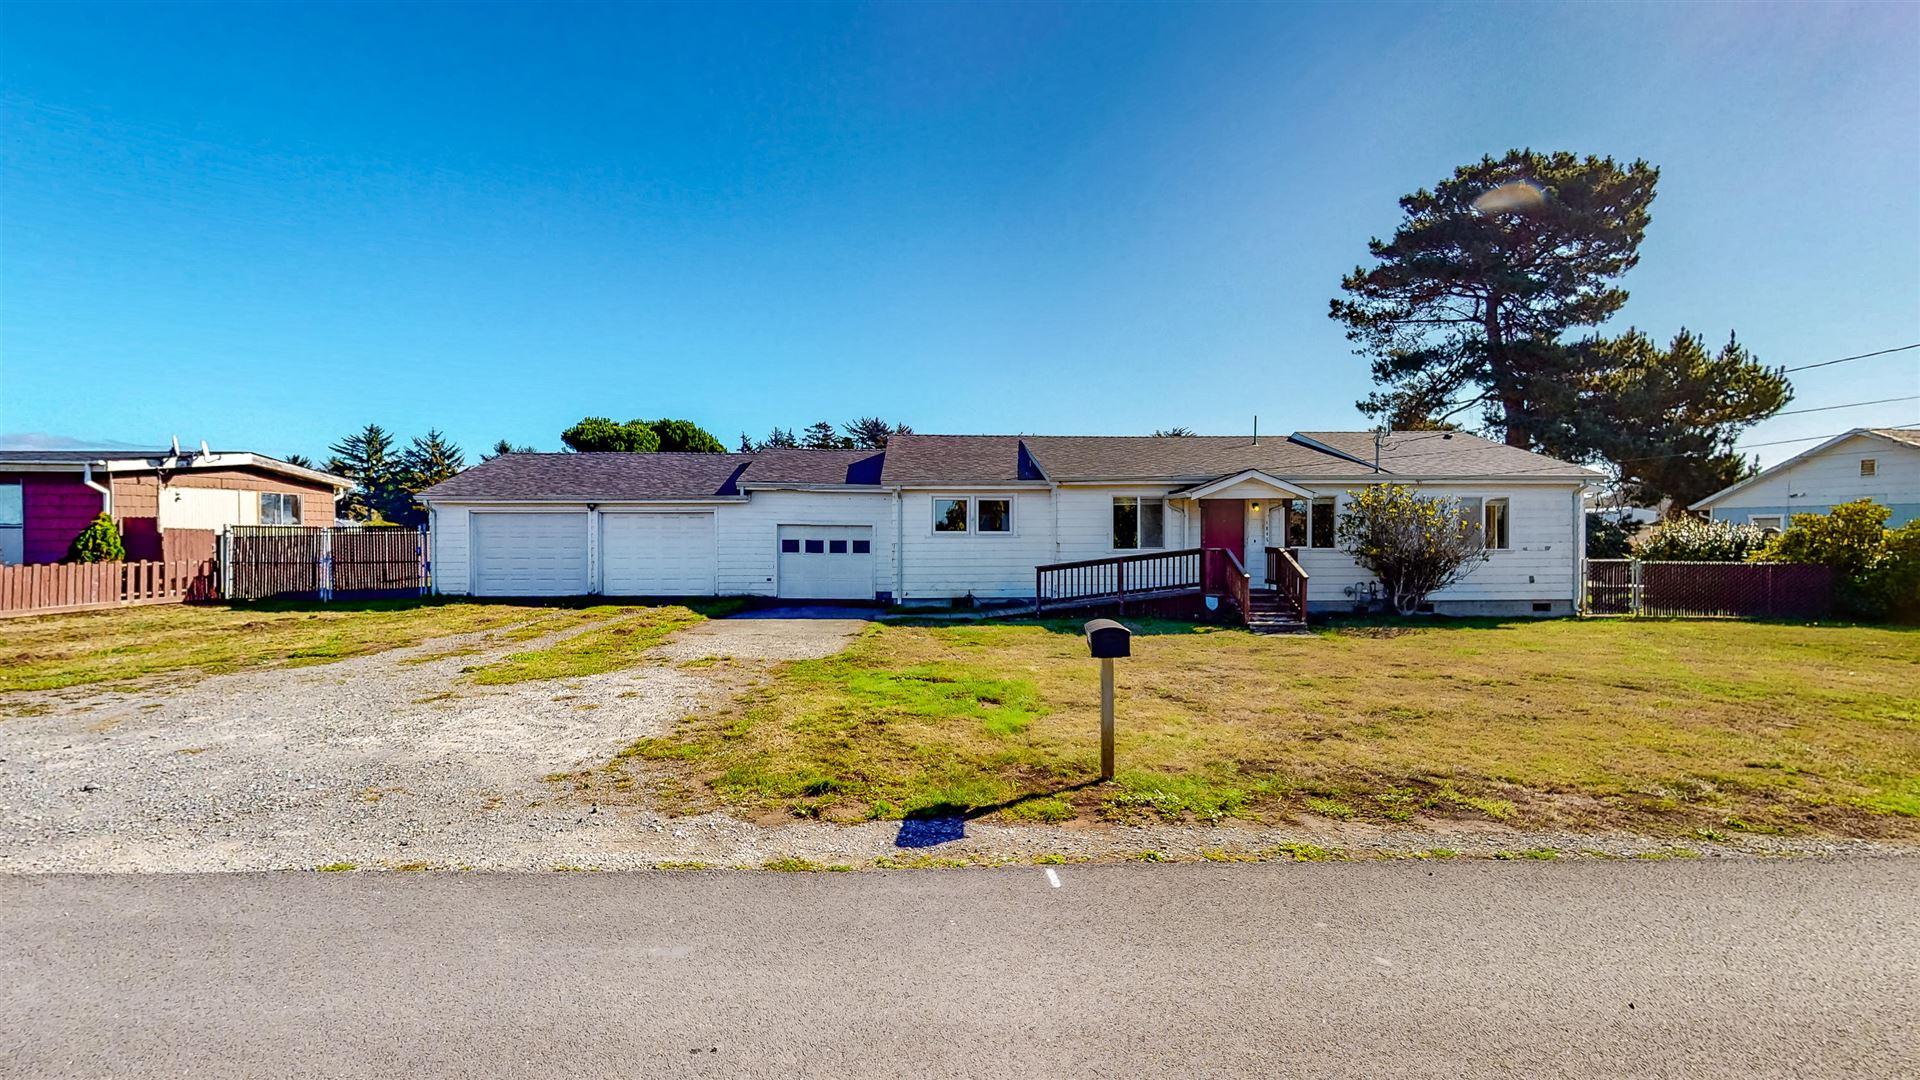 1945 Ashdown Avenue, McKinleyville, CA 95519 - MLS#: 257608